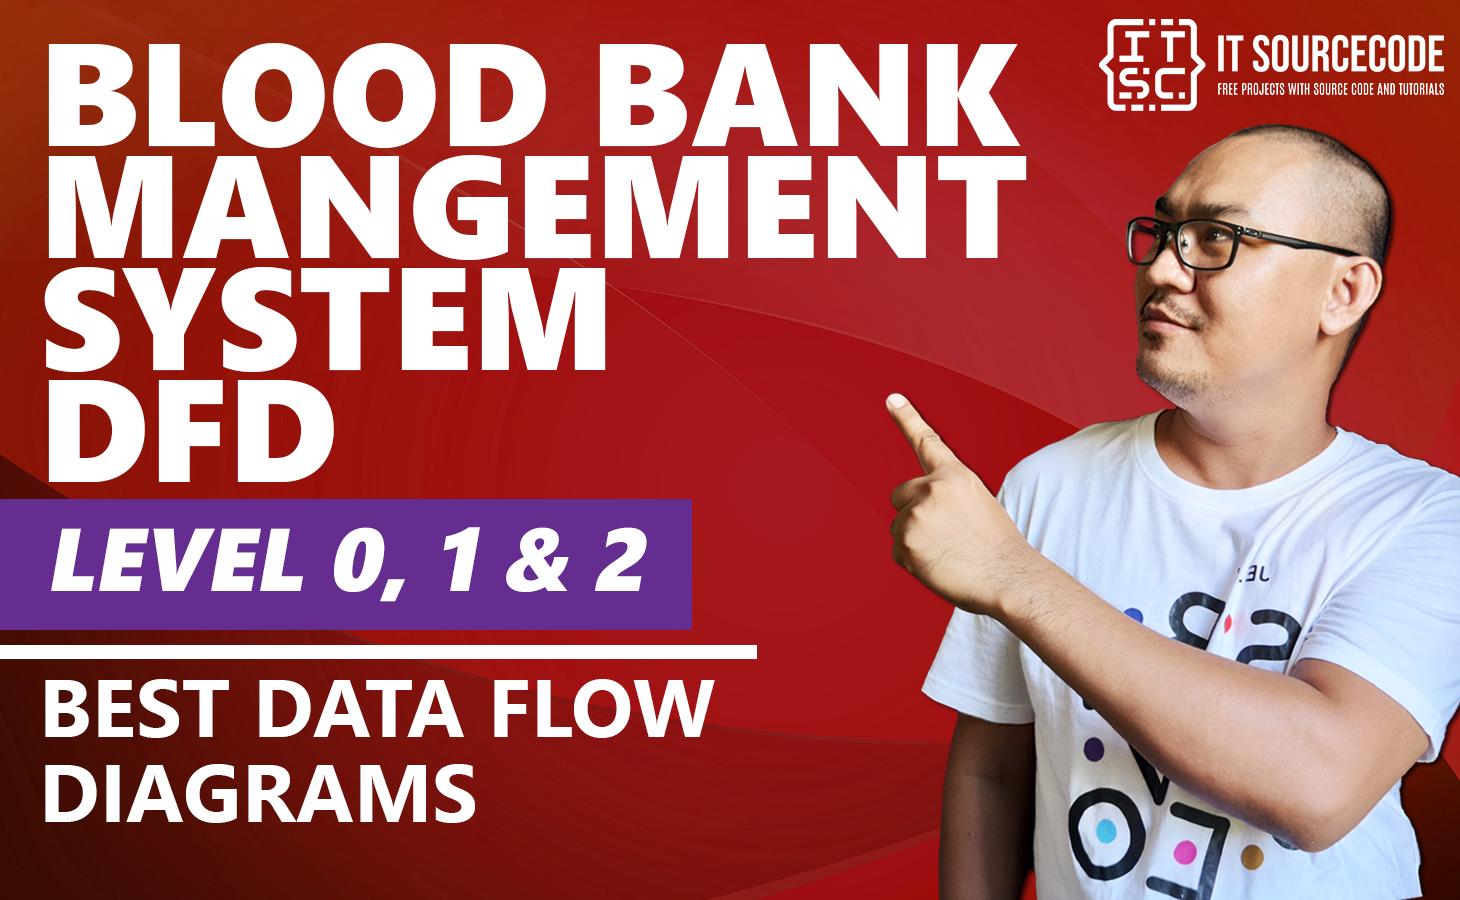 Best Data Flow Diagram - Blood Bank Management System DFD Level 0 1 2 - 2021